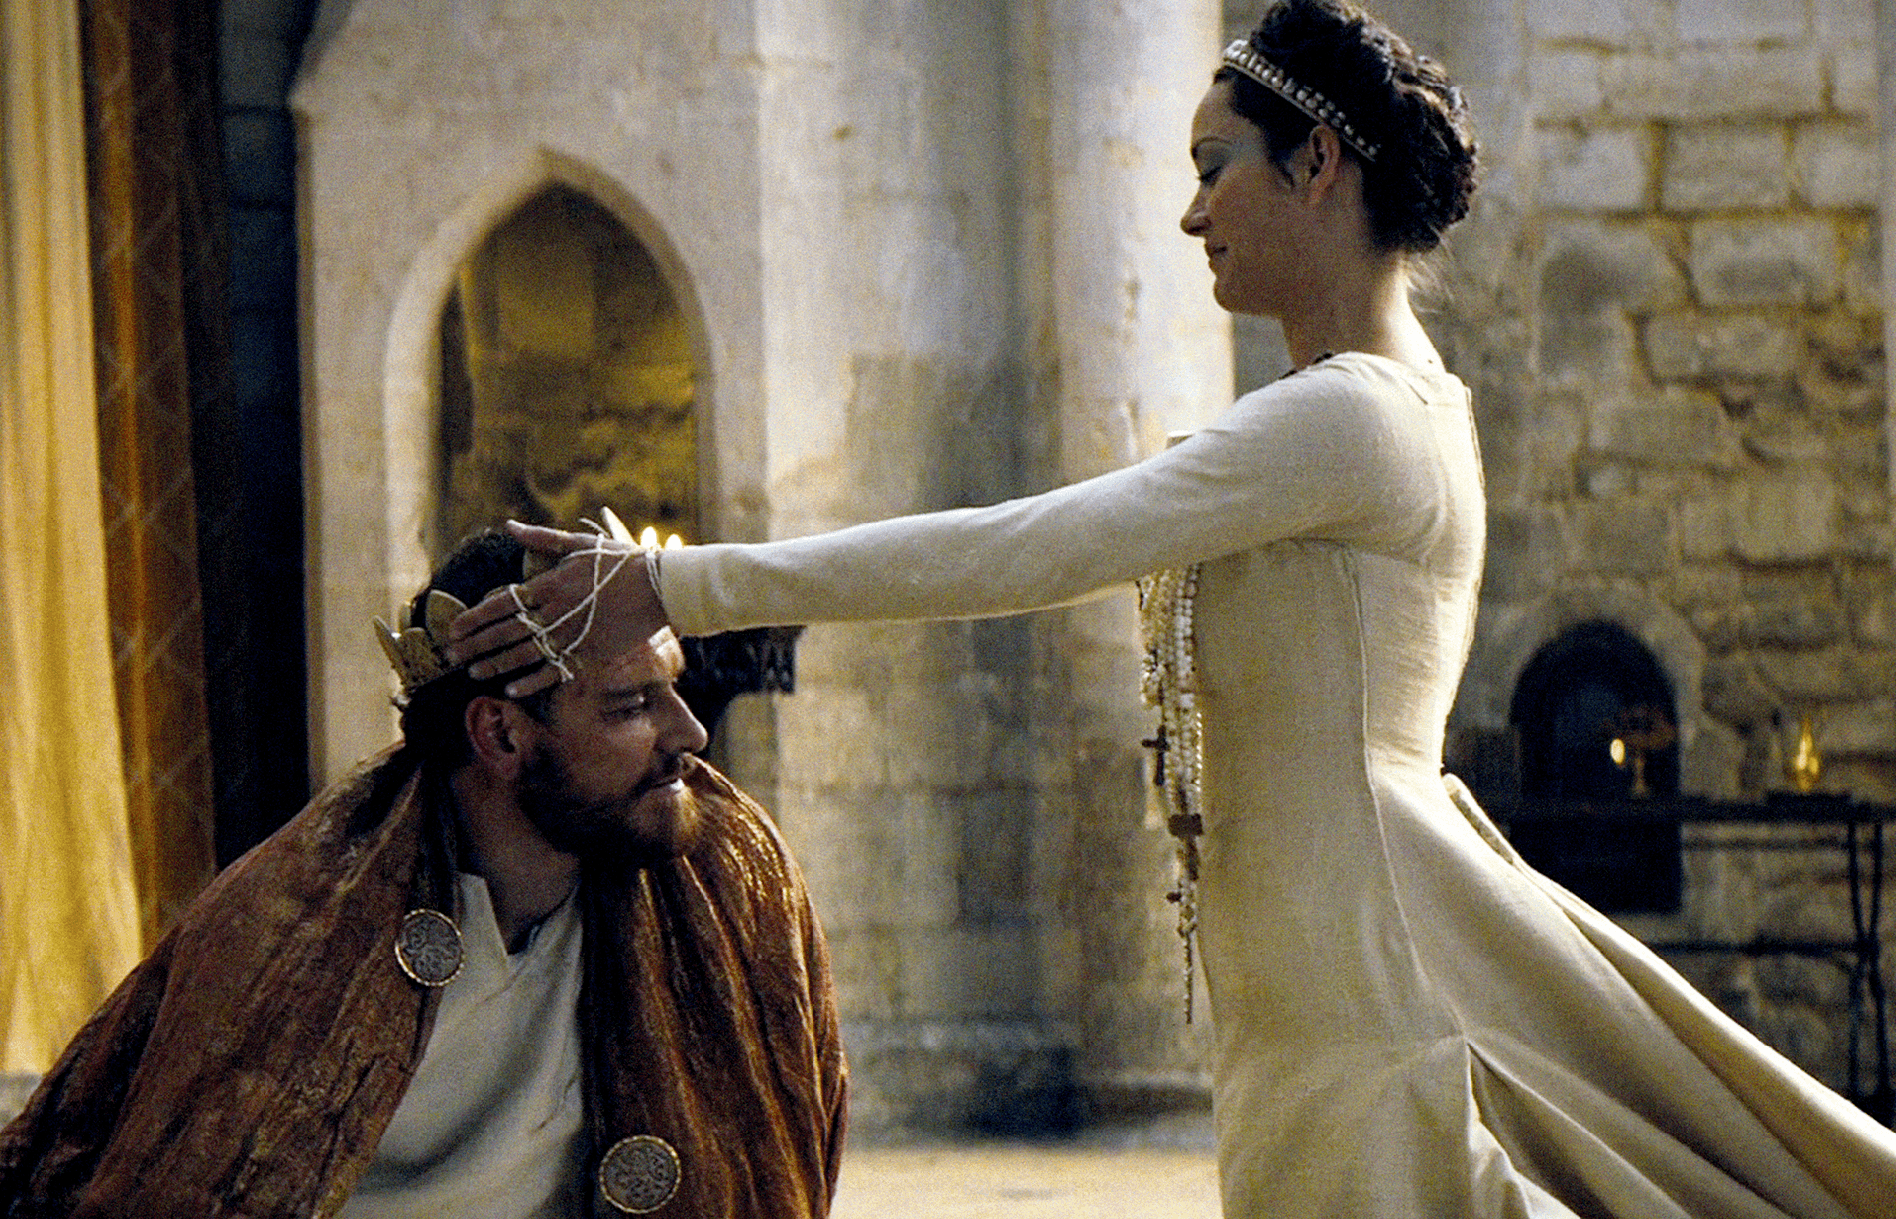 Photo from Macbeth Movie